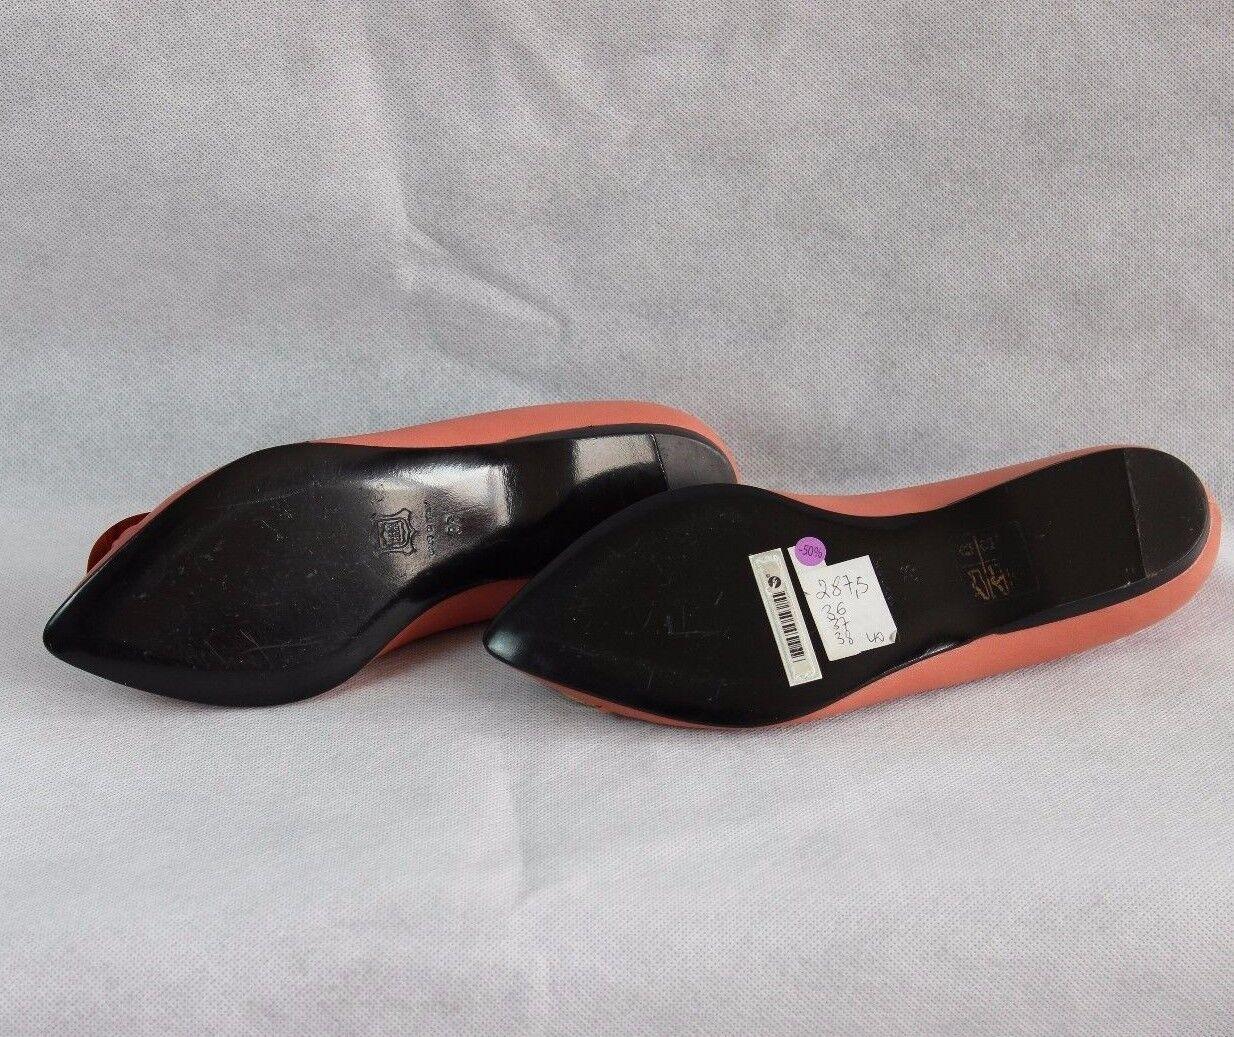 Pierre Hardy Ballerinas  36 Lo Ballerina Damen Schuhe 36  23cm UK3 US6 pumps 97d537